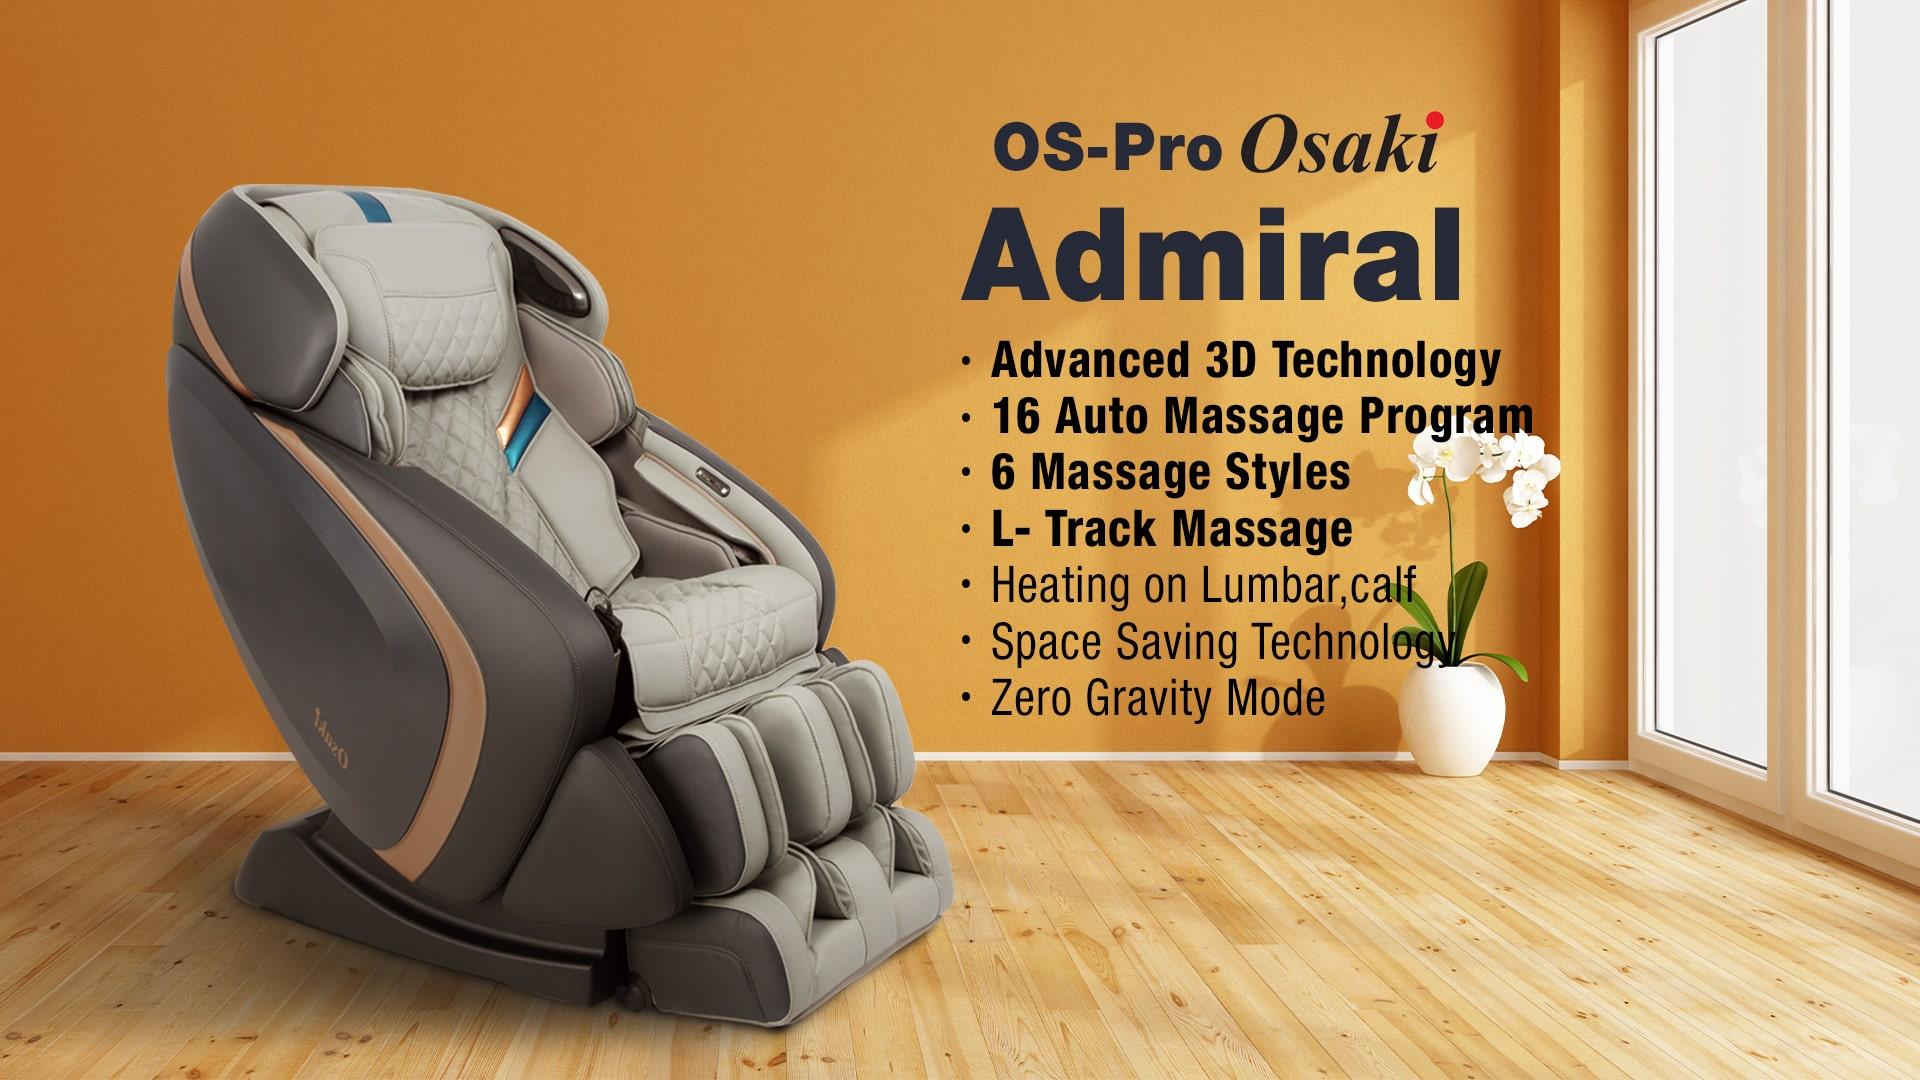 Osaki OS-Pro Admiral Massage Chair